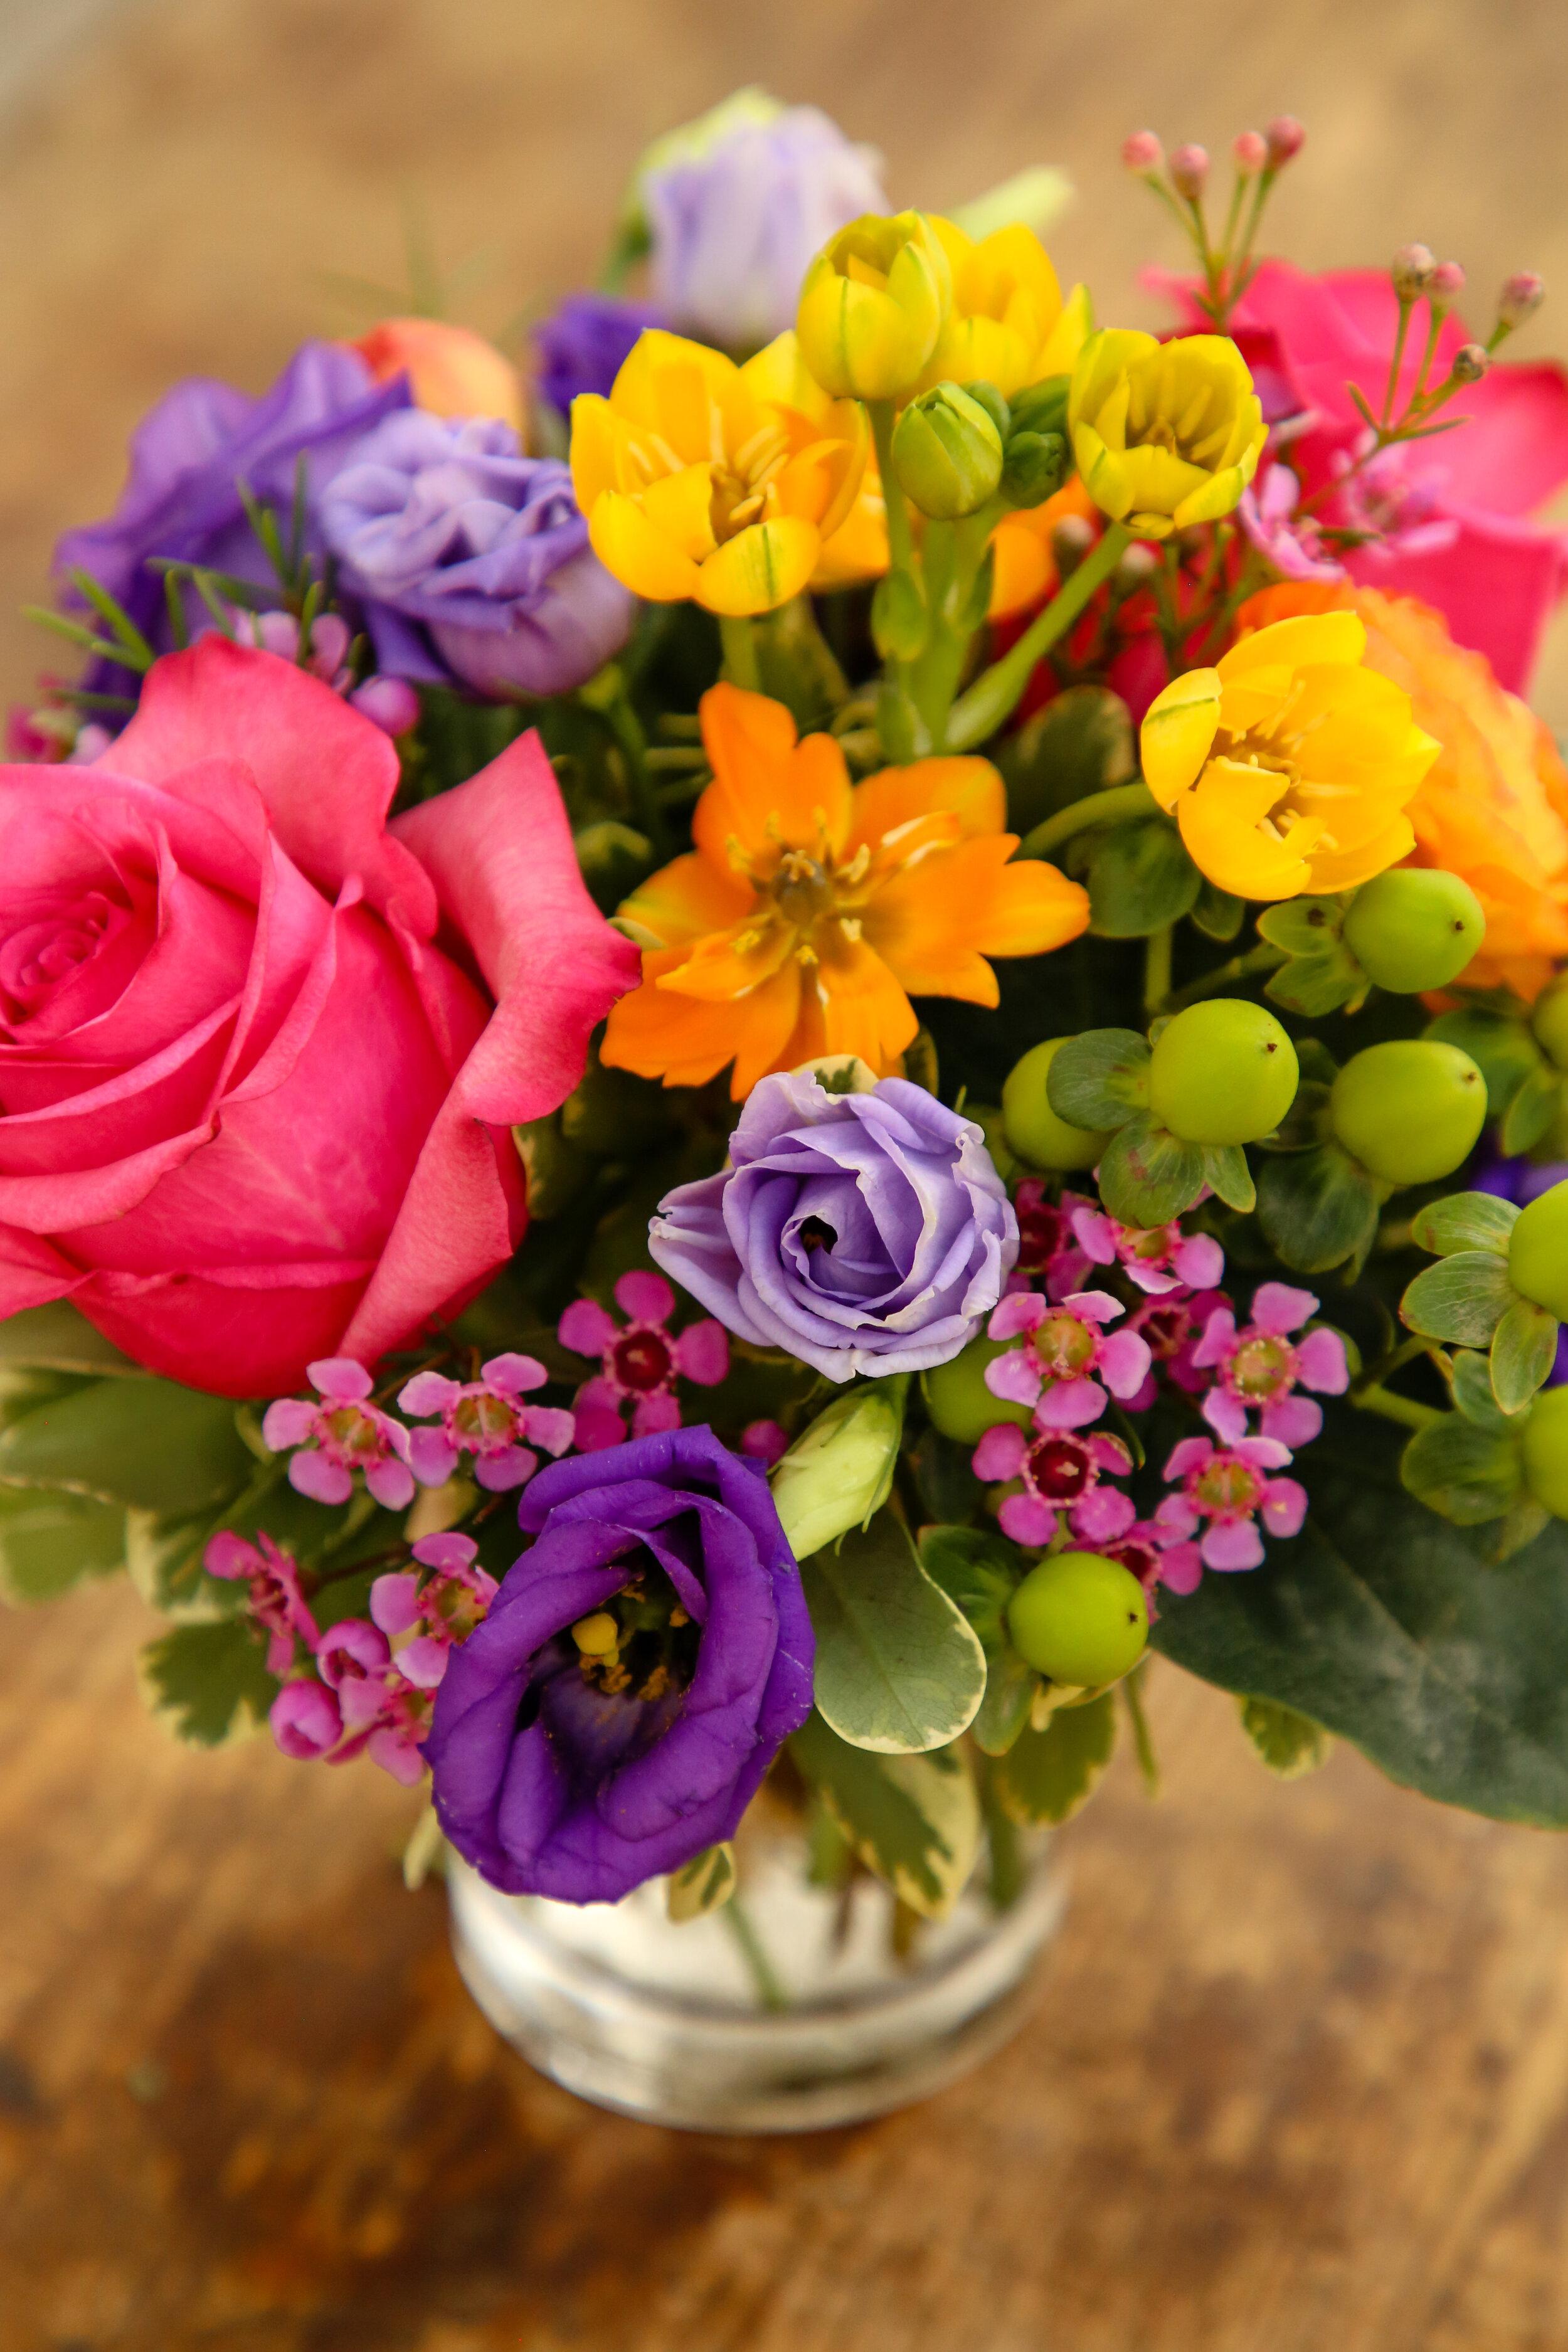 Palate_Flower+BarShoot_Aug282019-8.jpg